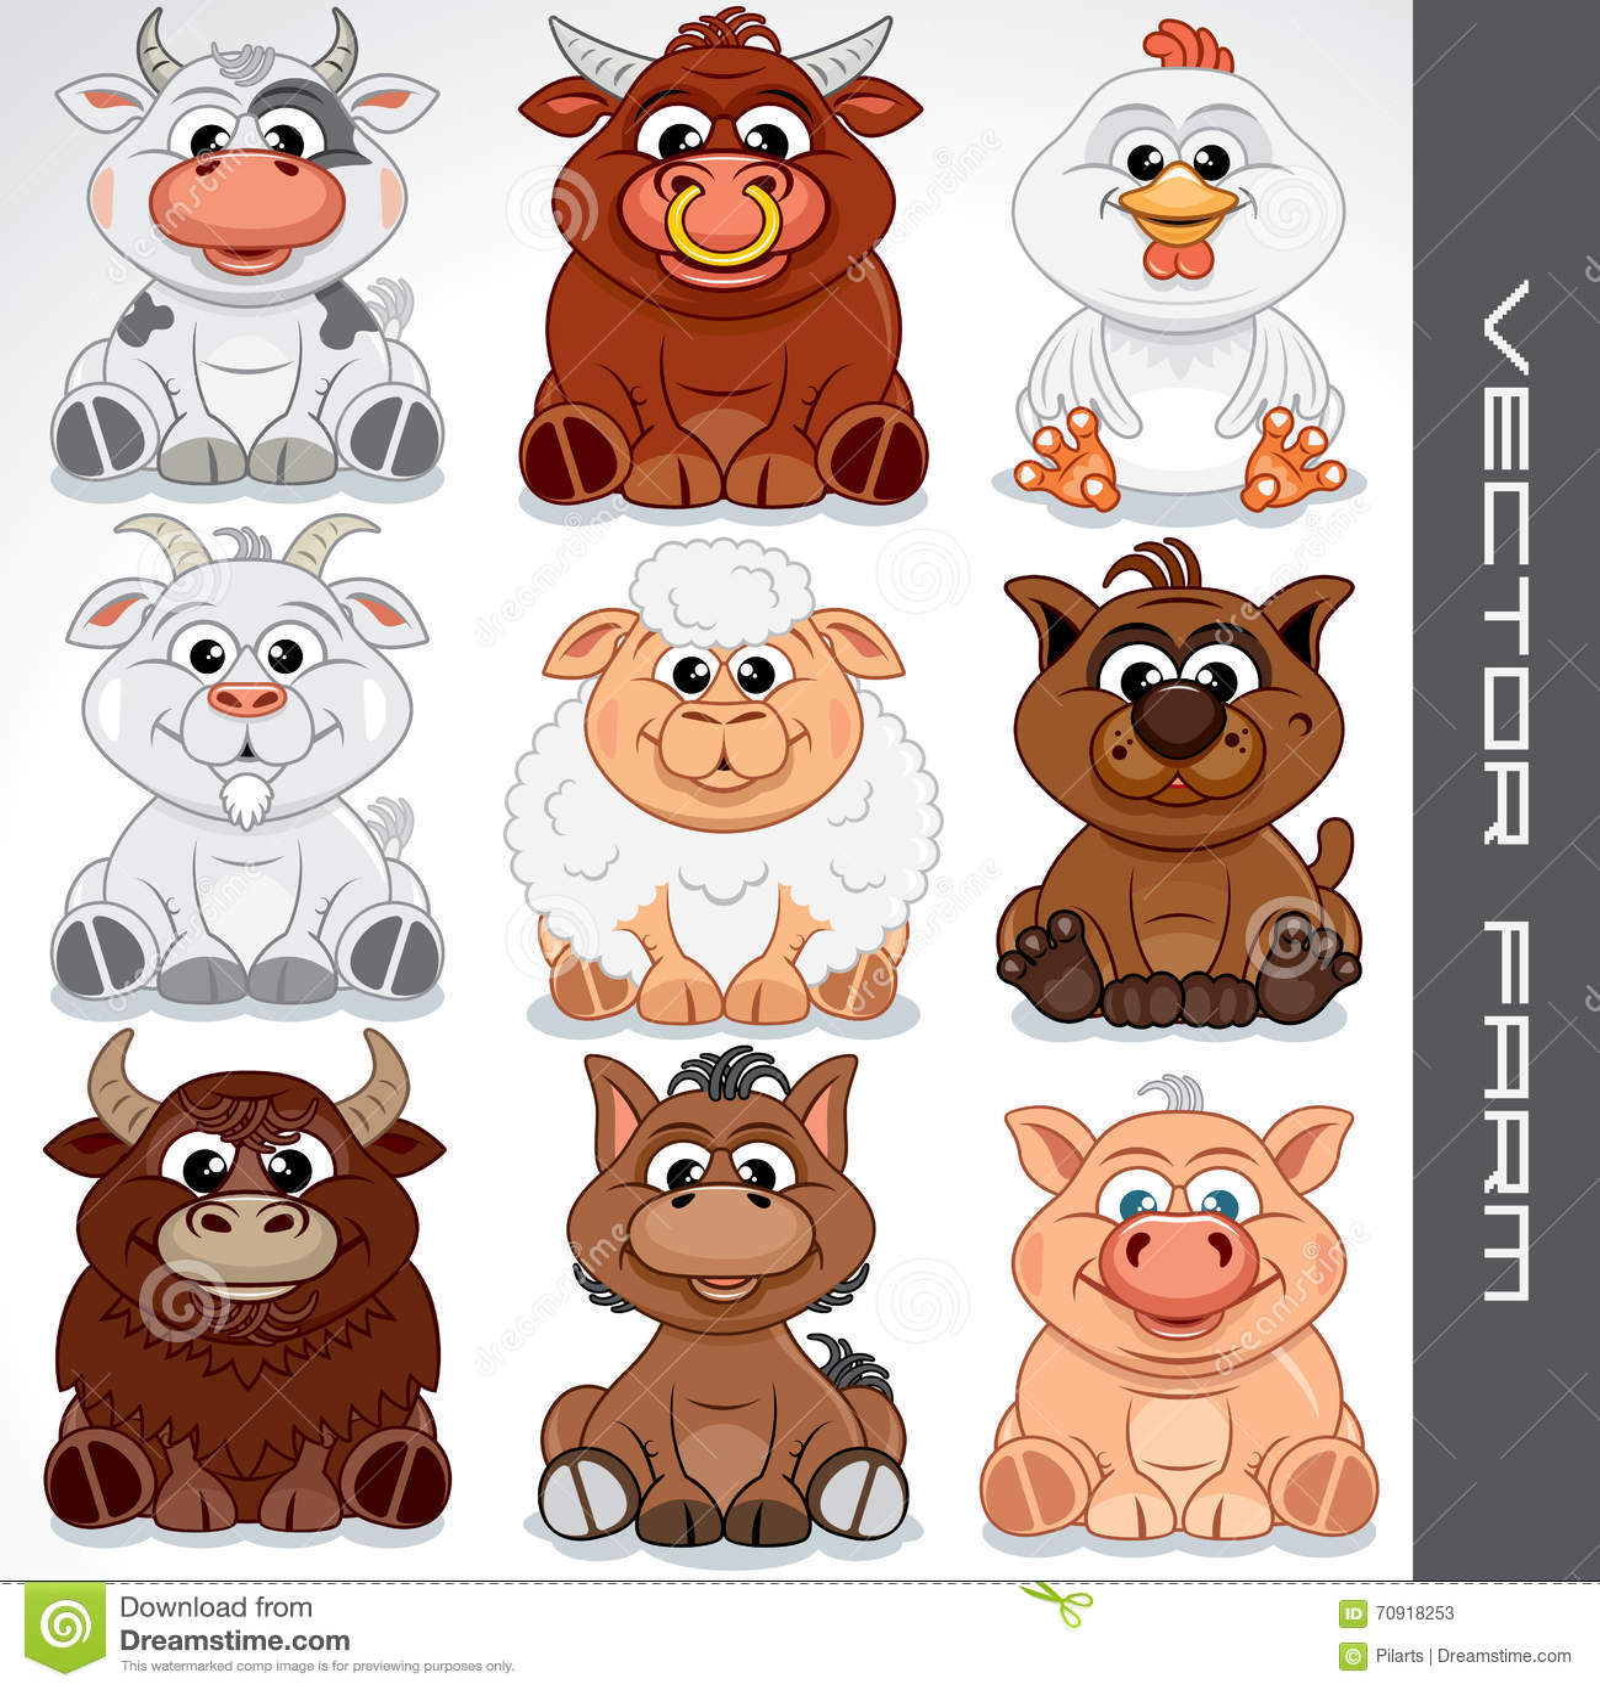 Happy children with farm animals - Download Free Vectors, Clipart Graphics  & Vector Art